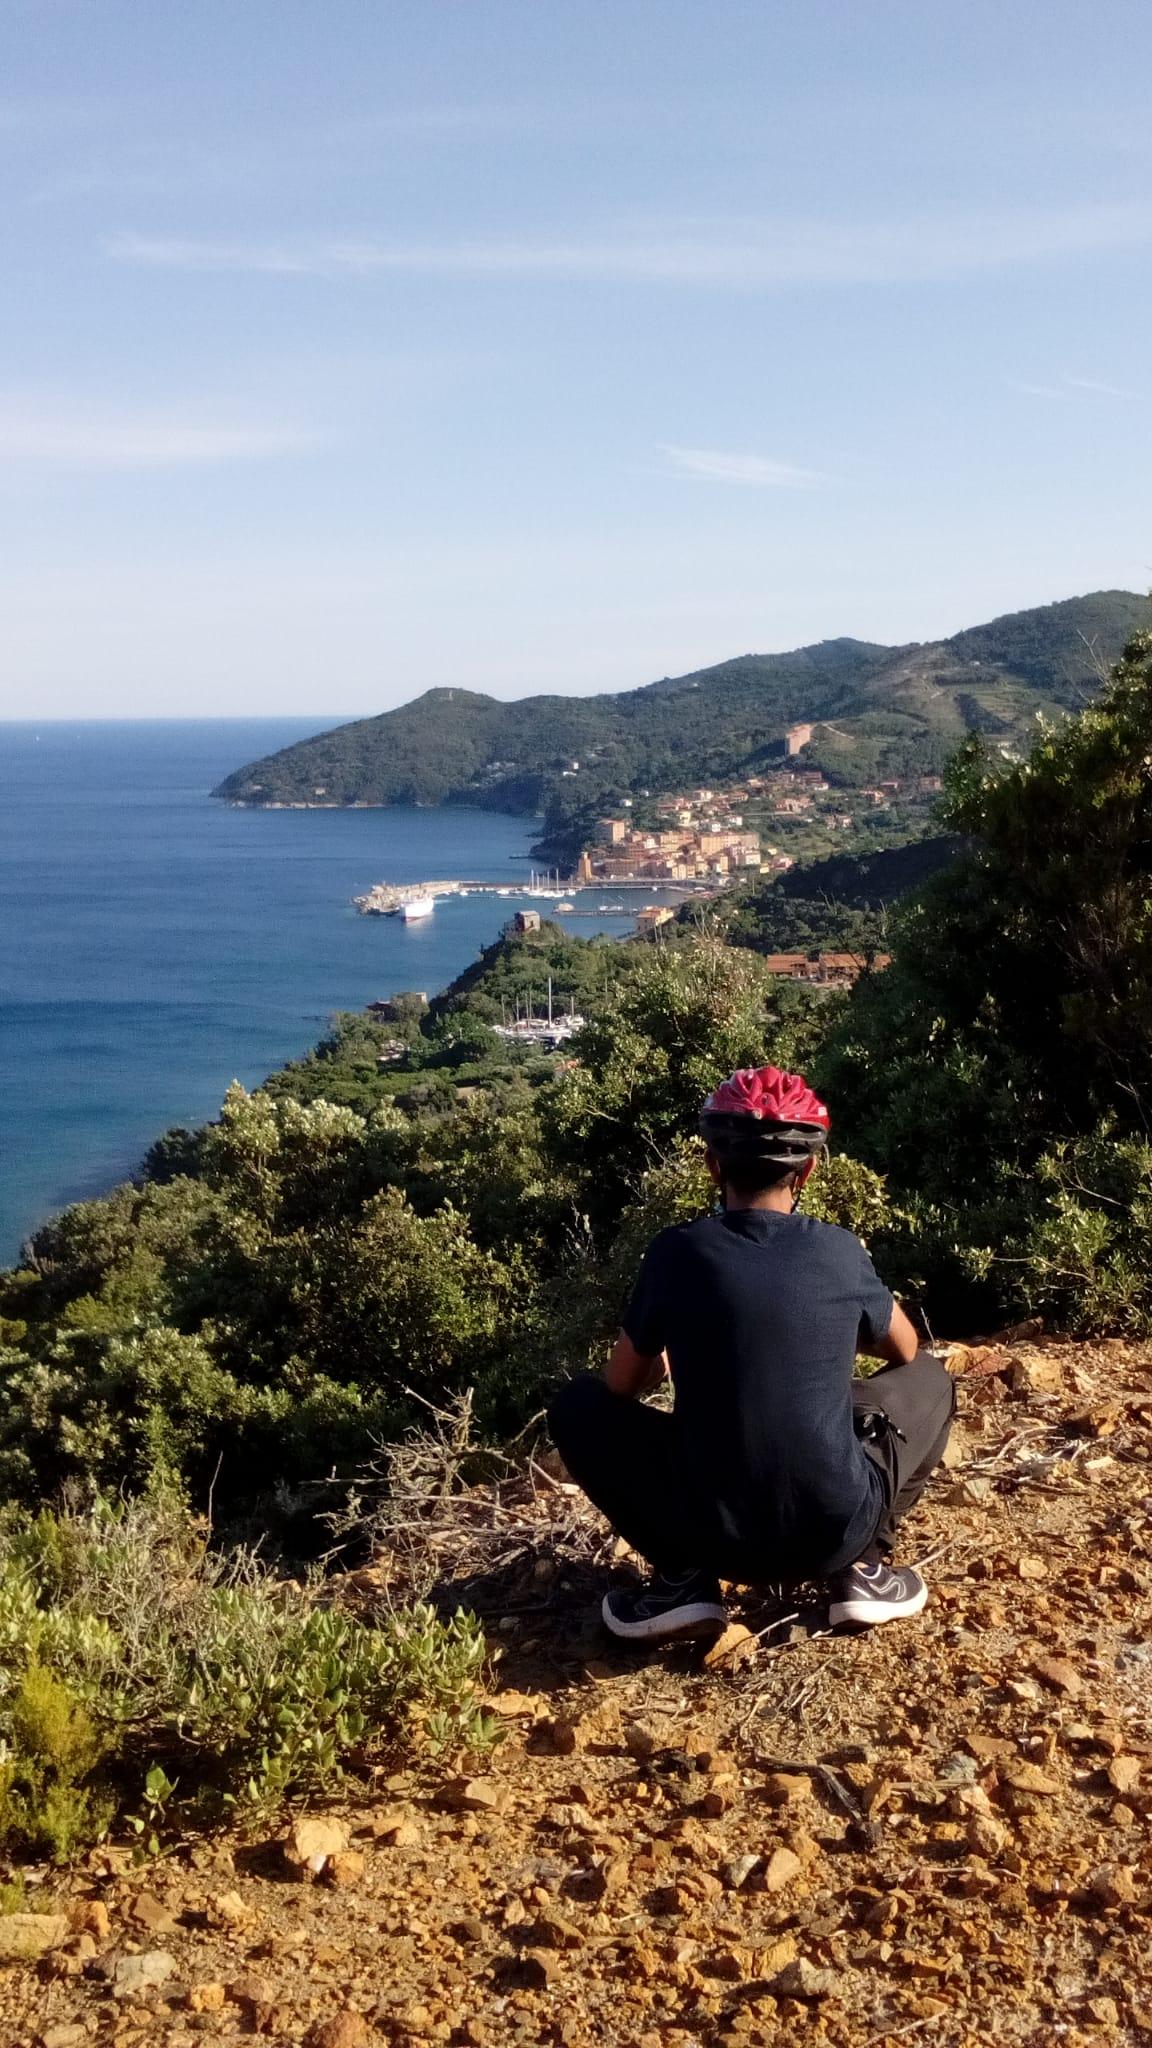 Vincenzo Country E-Bike Rent